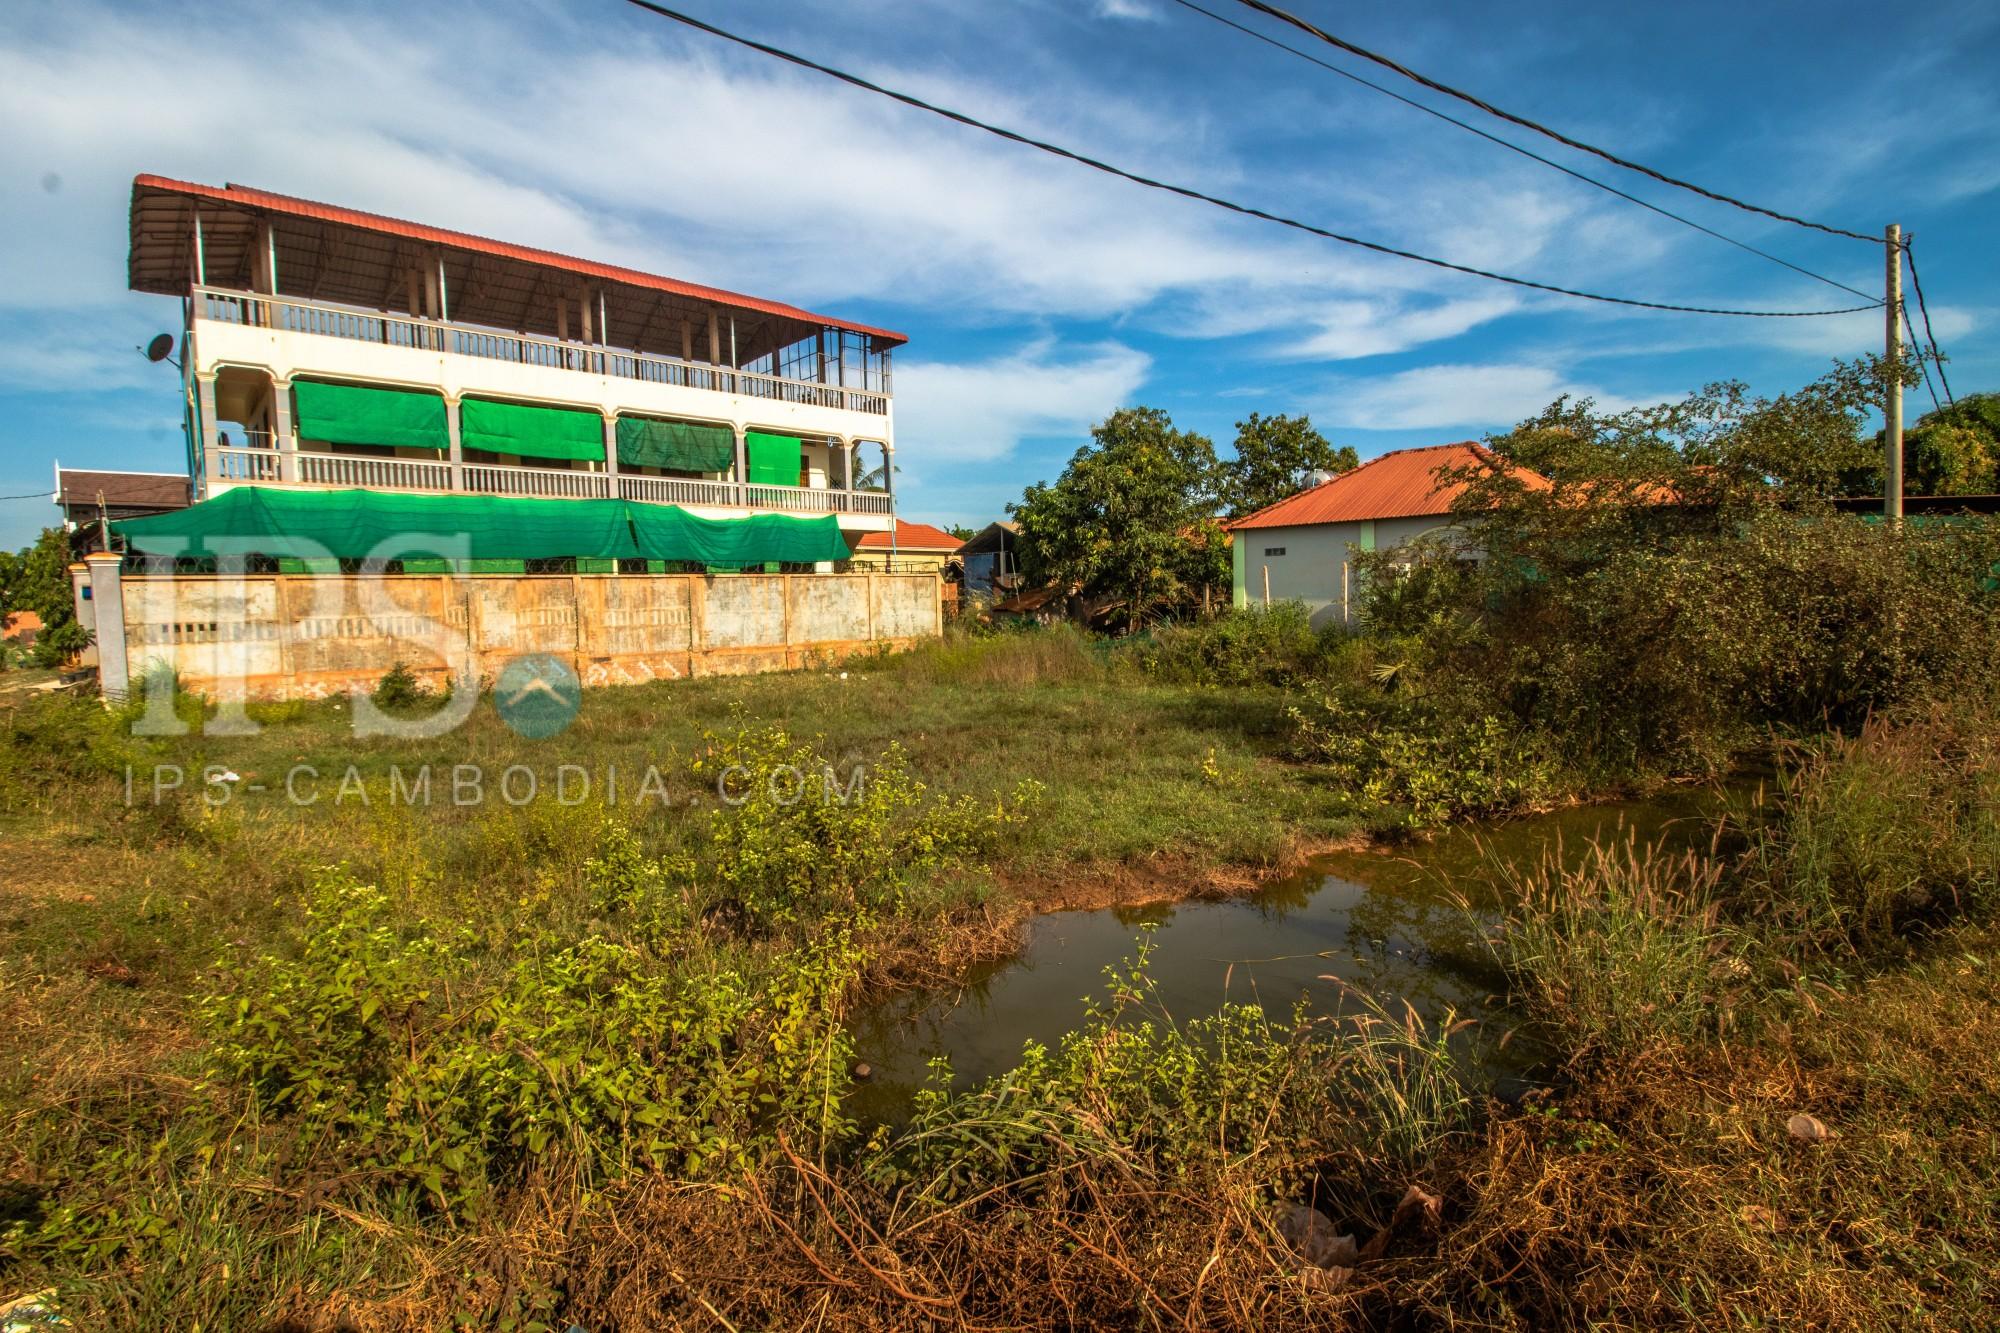 455 Sqm Land For Sale - Svay Dangkum, Siem Reap